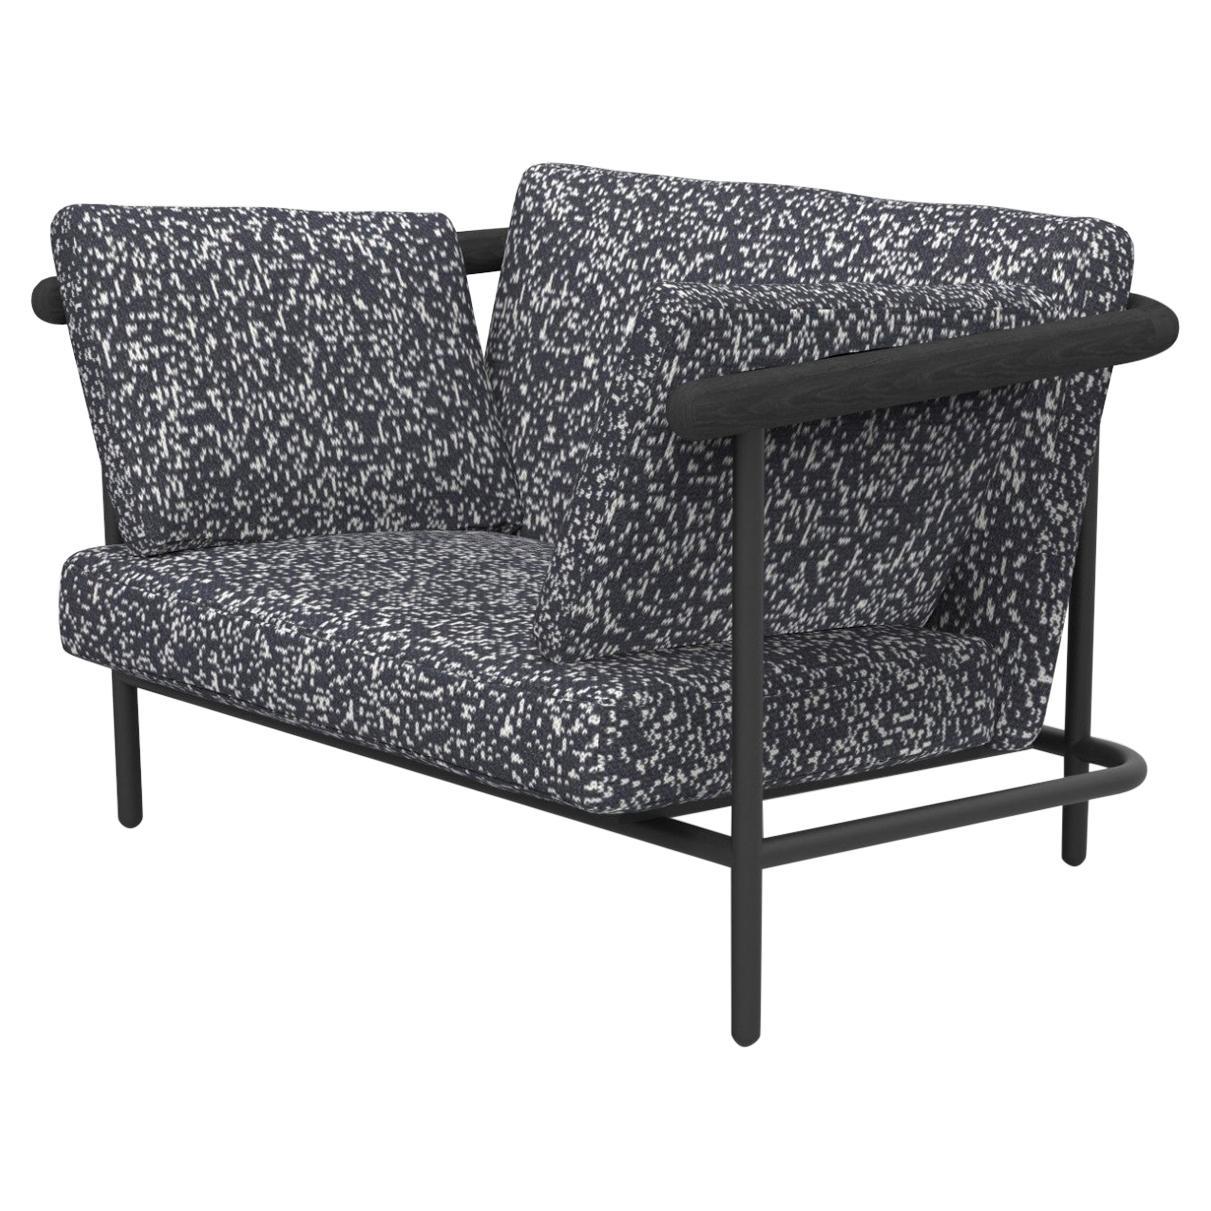 "Upholstered ""X-Rays"" Armchair, Alain Gilles"